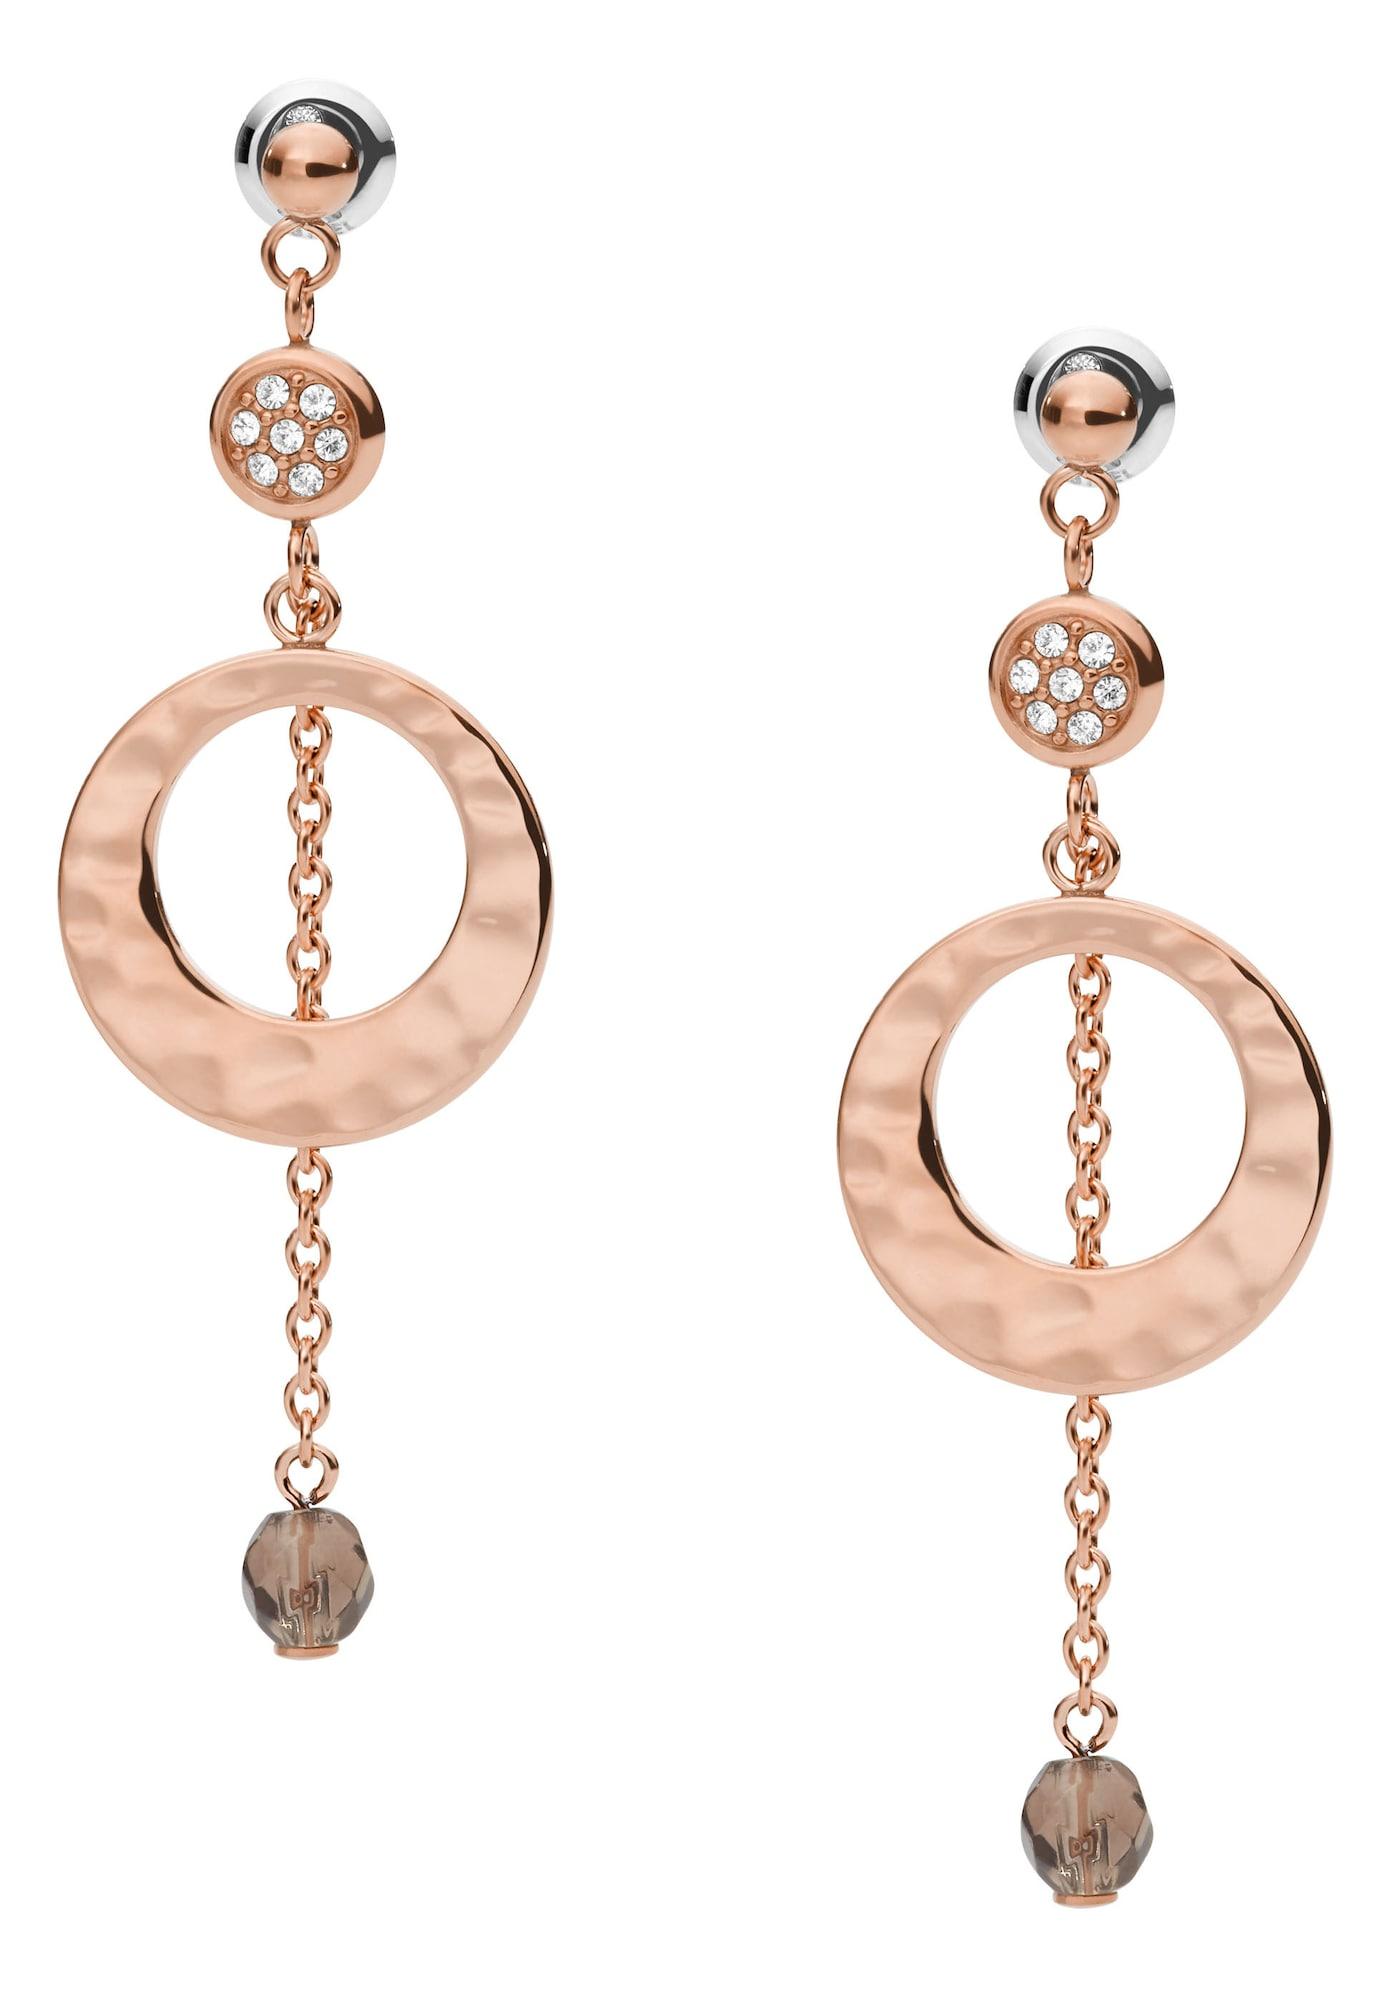 FOSSIL Auskarai rožinio aukso spalva / balta